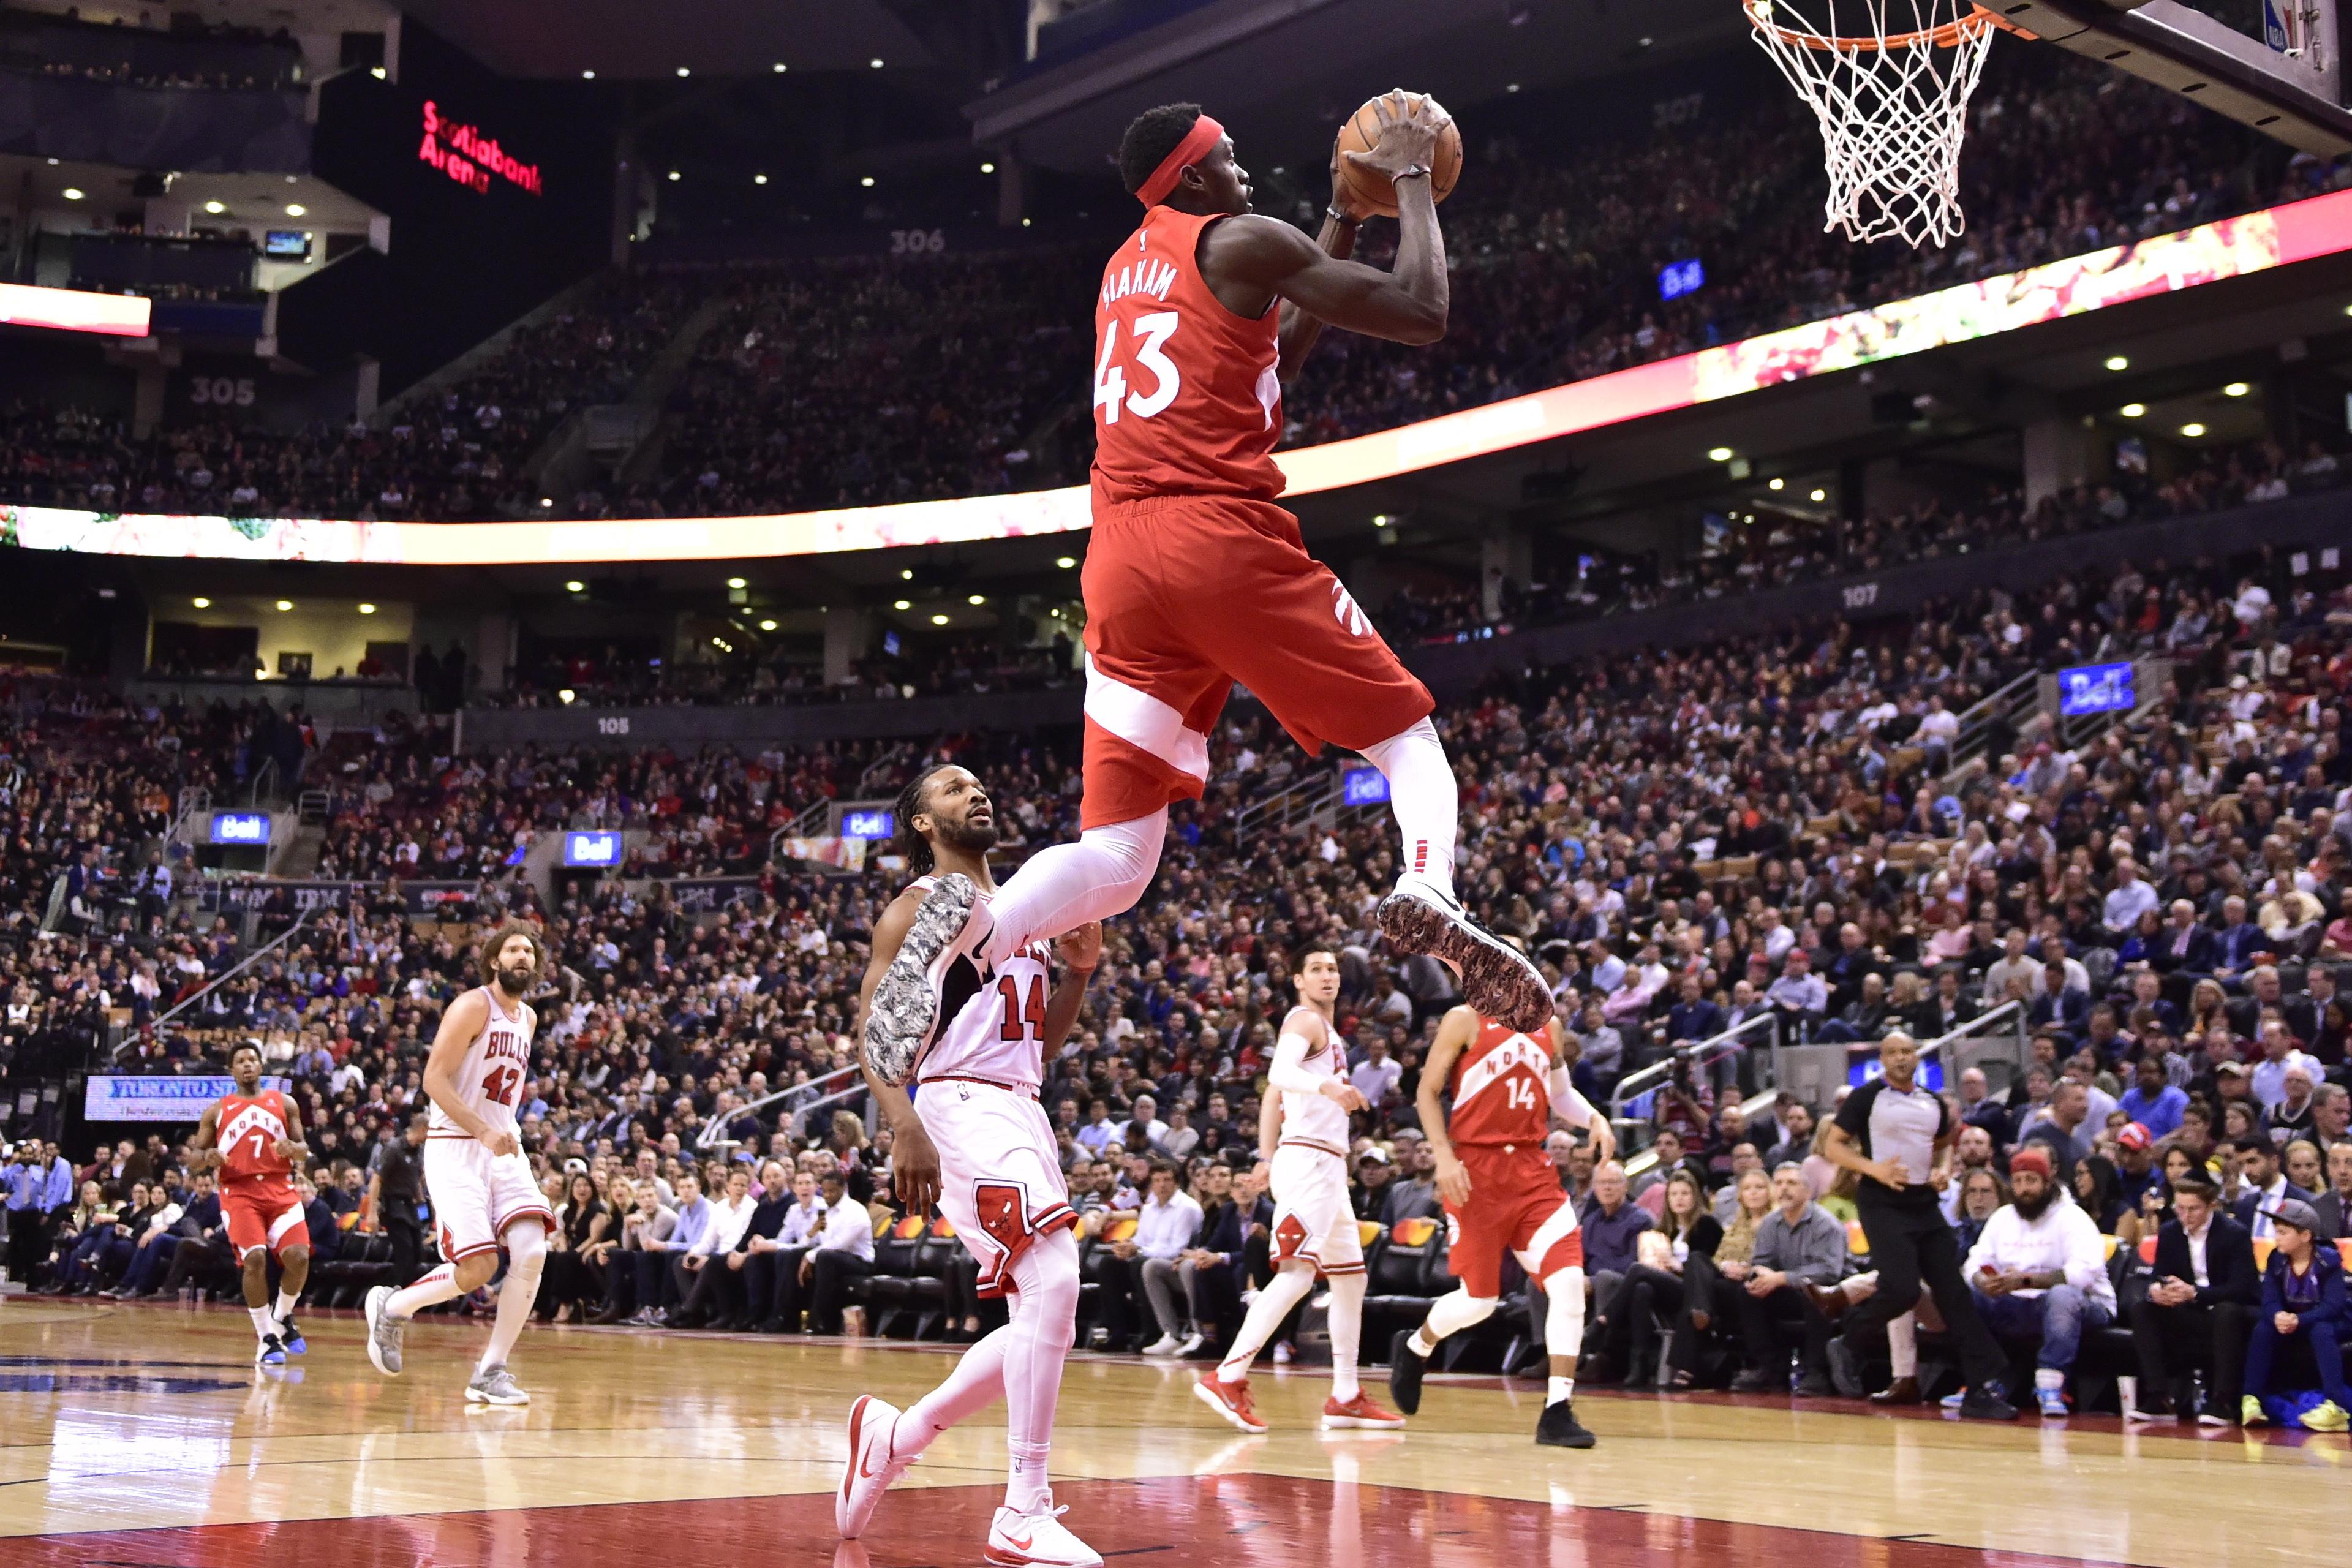 Powell scores 20 as Raptors beat struggling Bulls 112-103